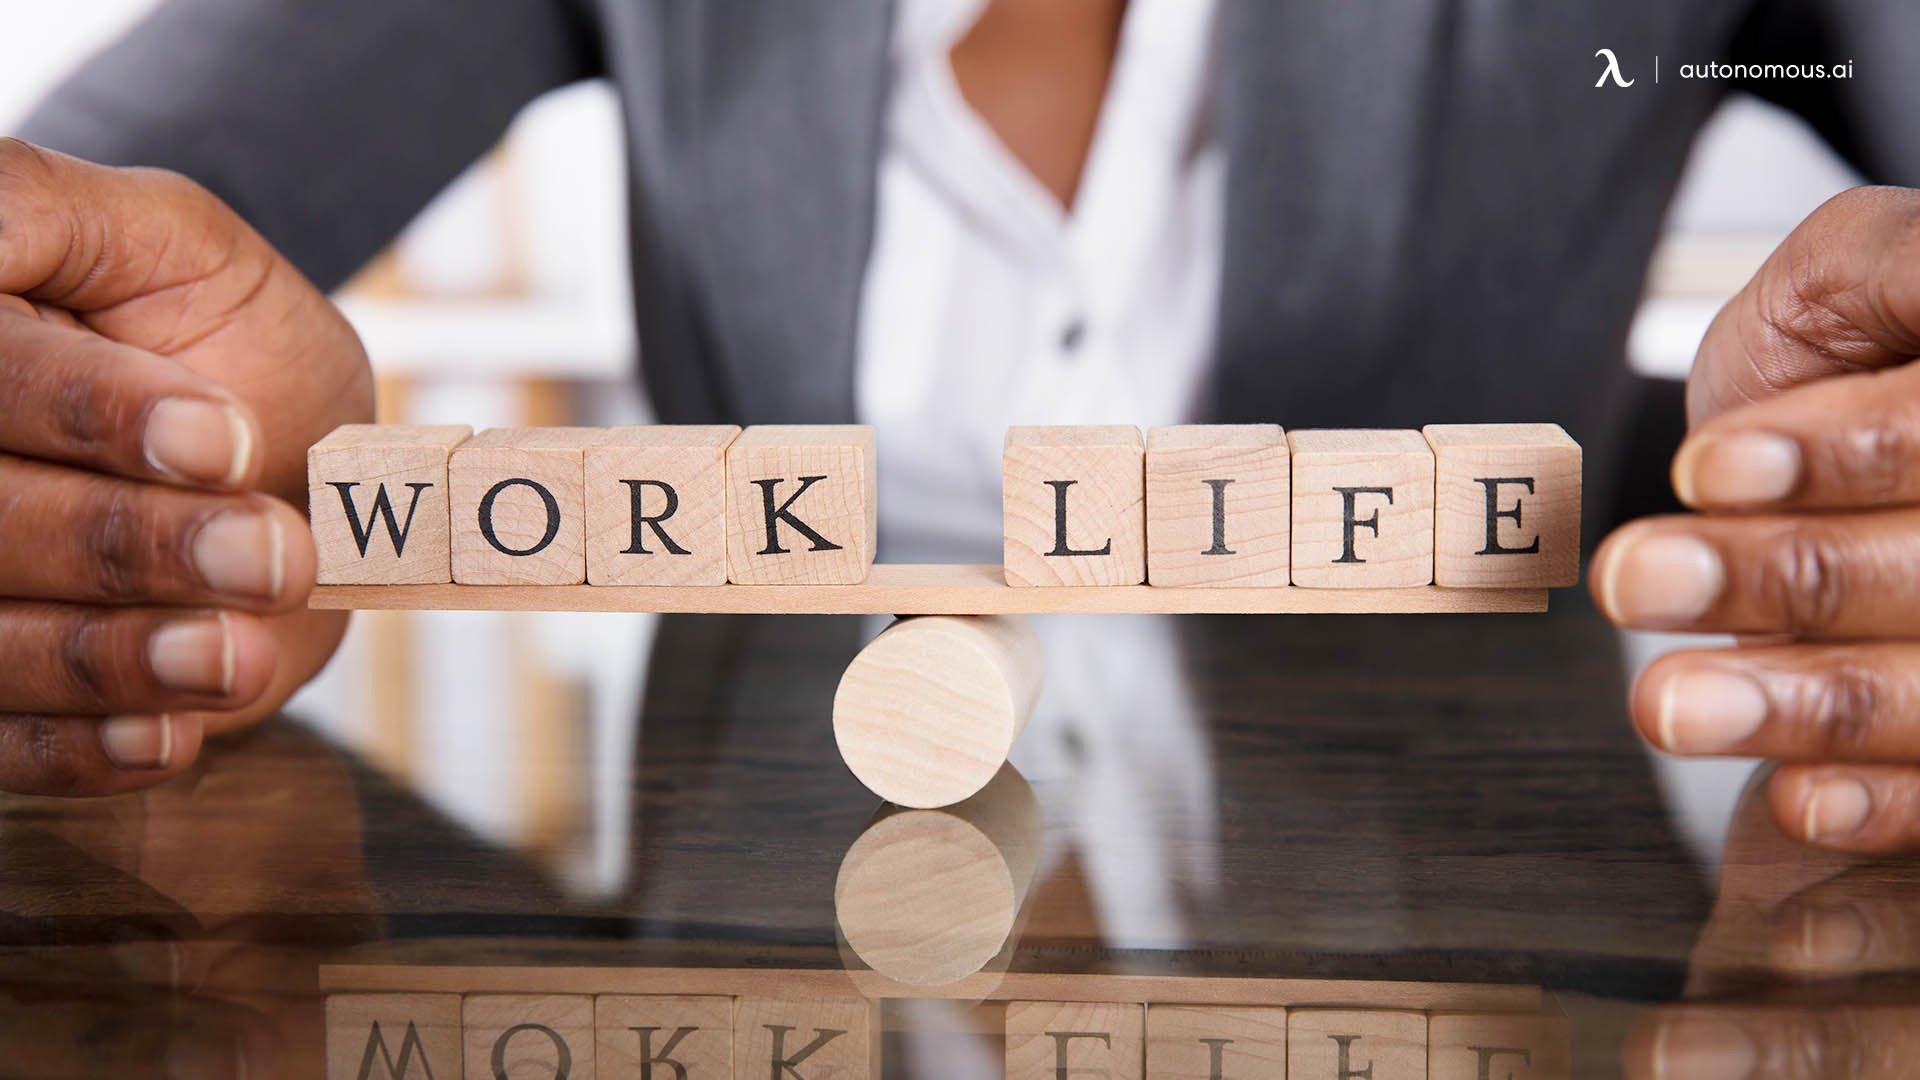 No work Life balance